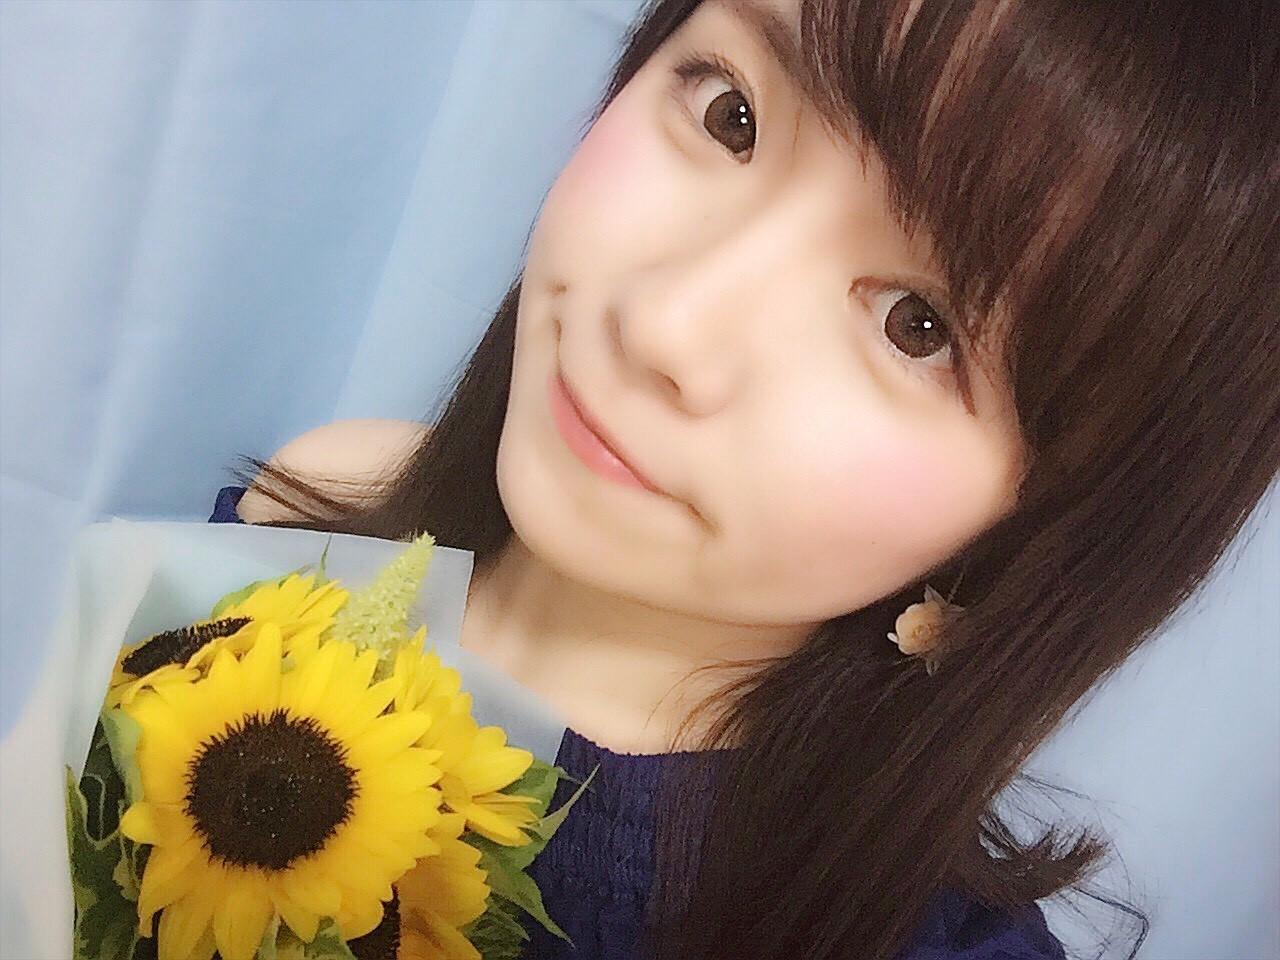 OoMAImai - Japanese webcam girl